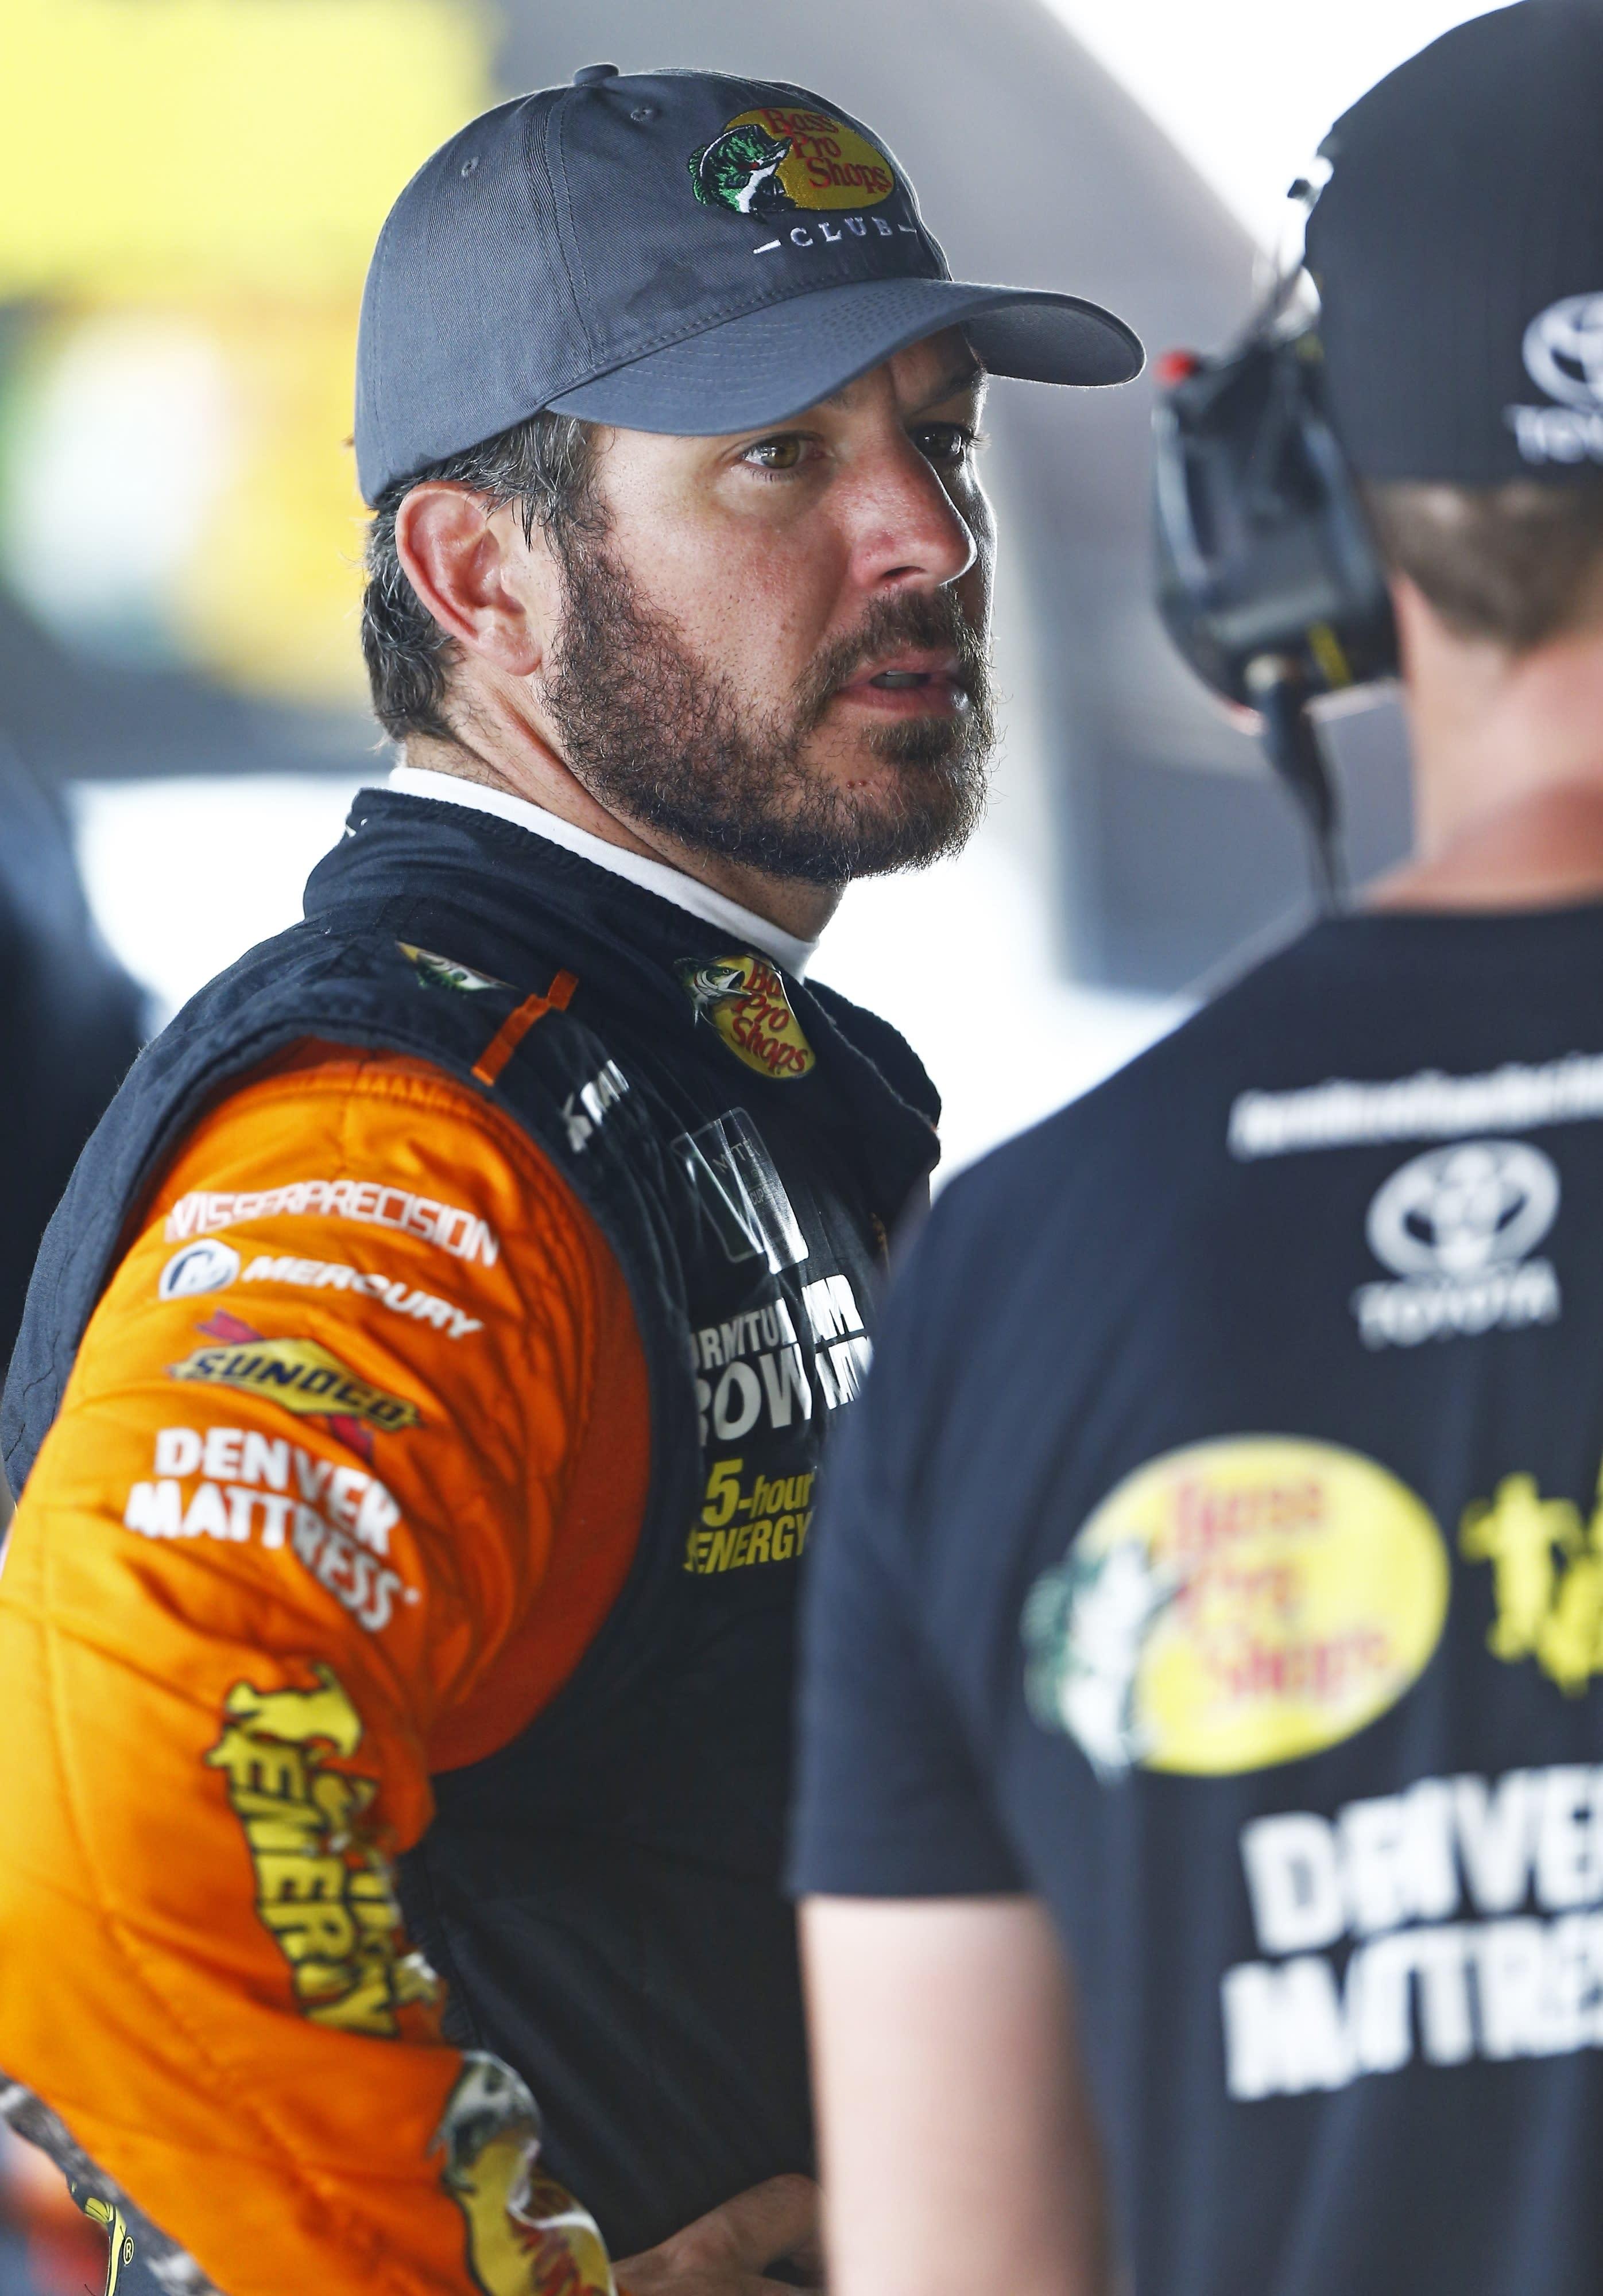 NASCAR champion Truex needs sponsor to keep team intact